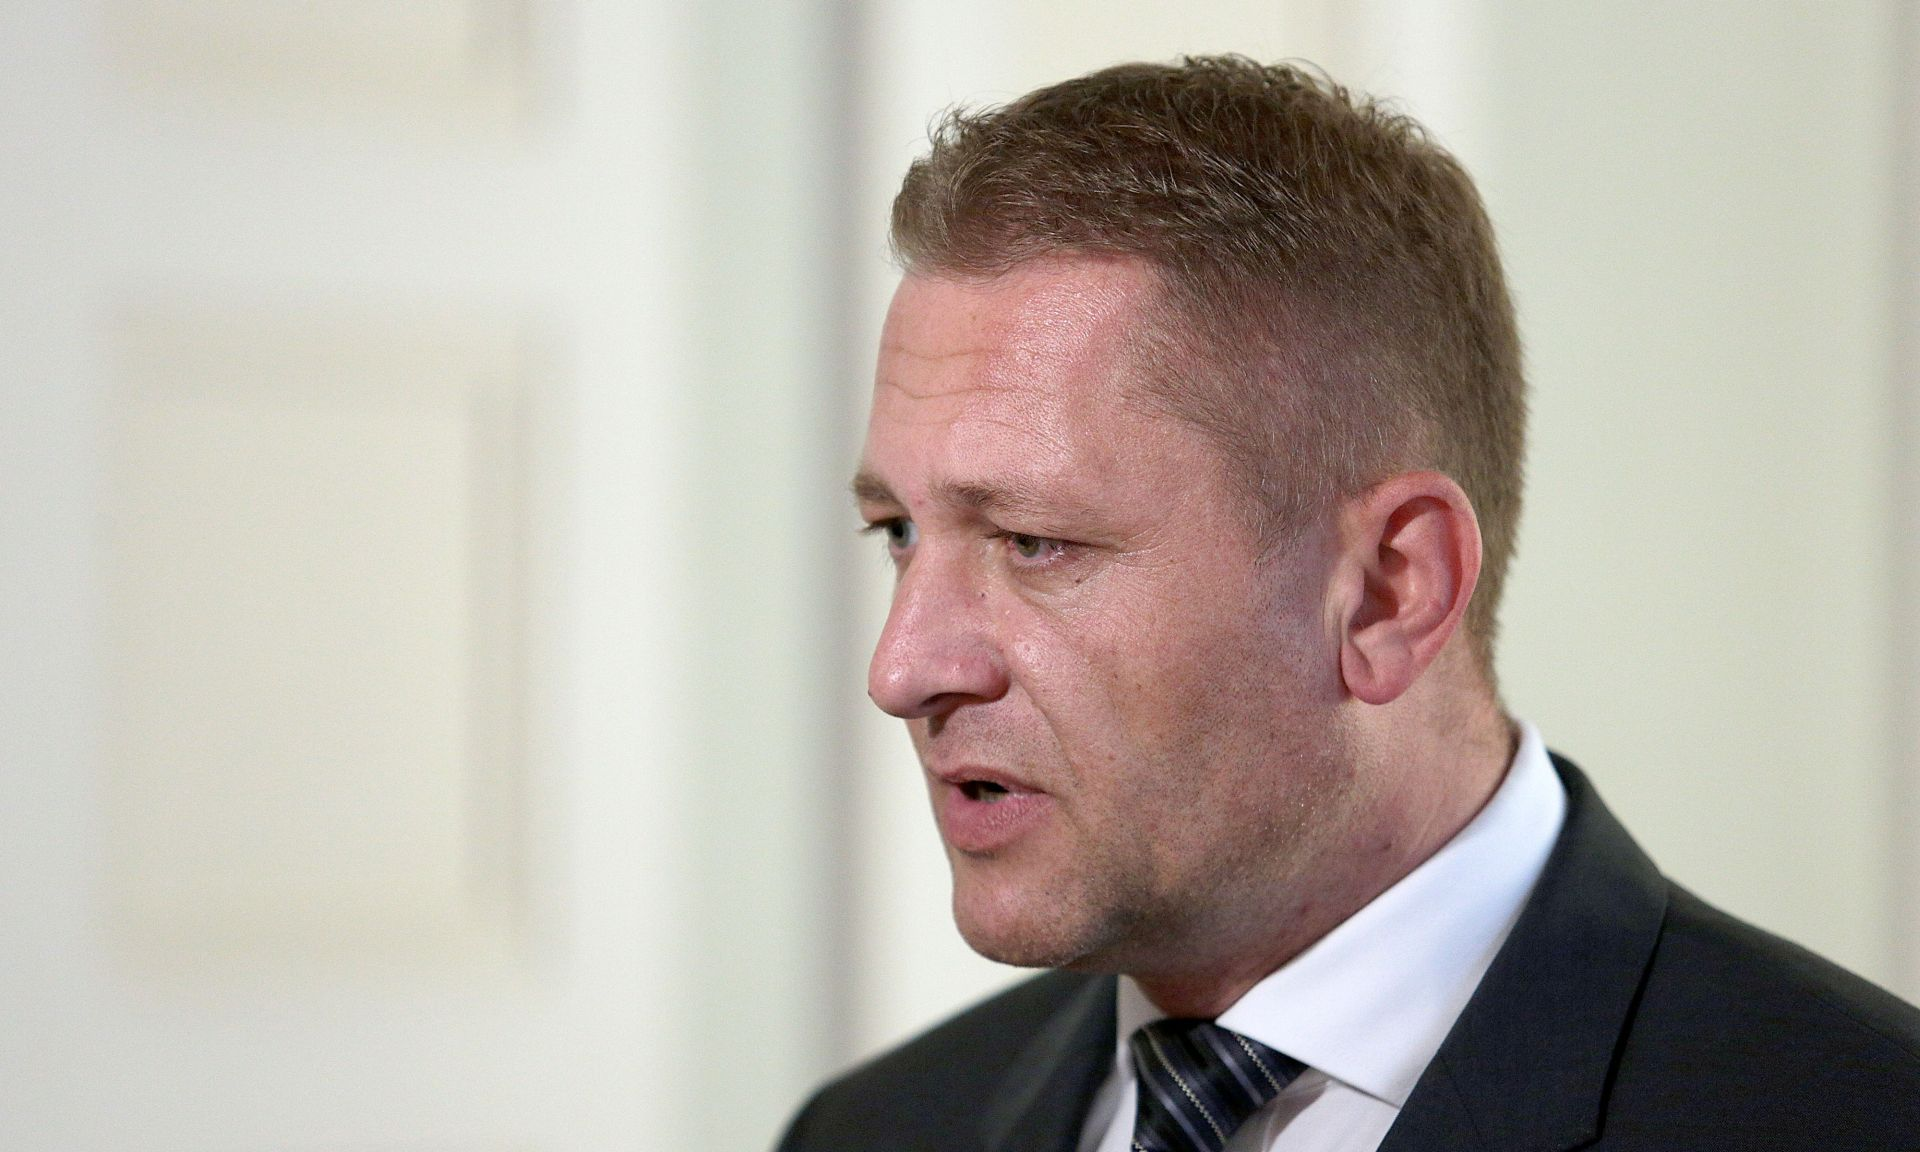 Krešo Beljak jedini kandidat za predsjednika HSS-a